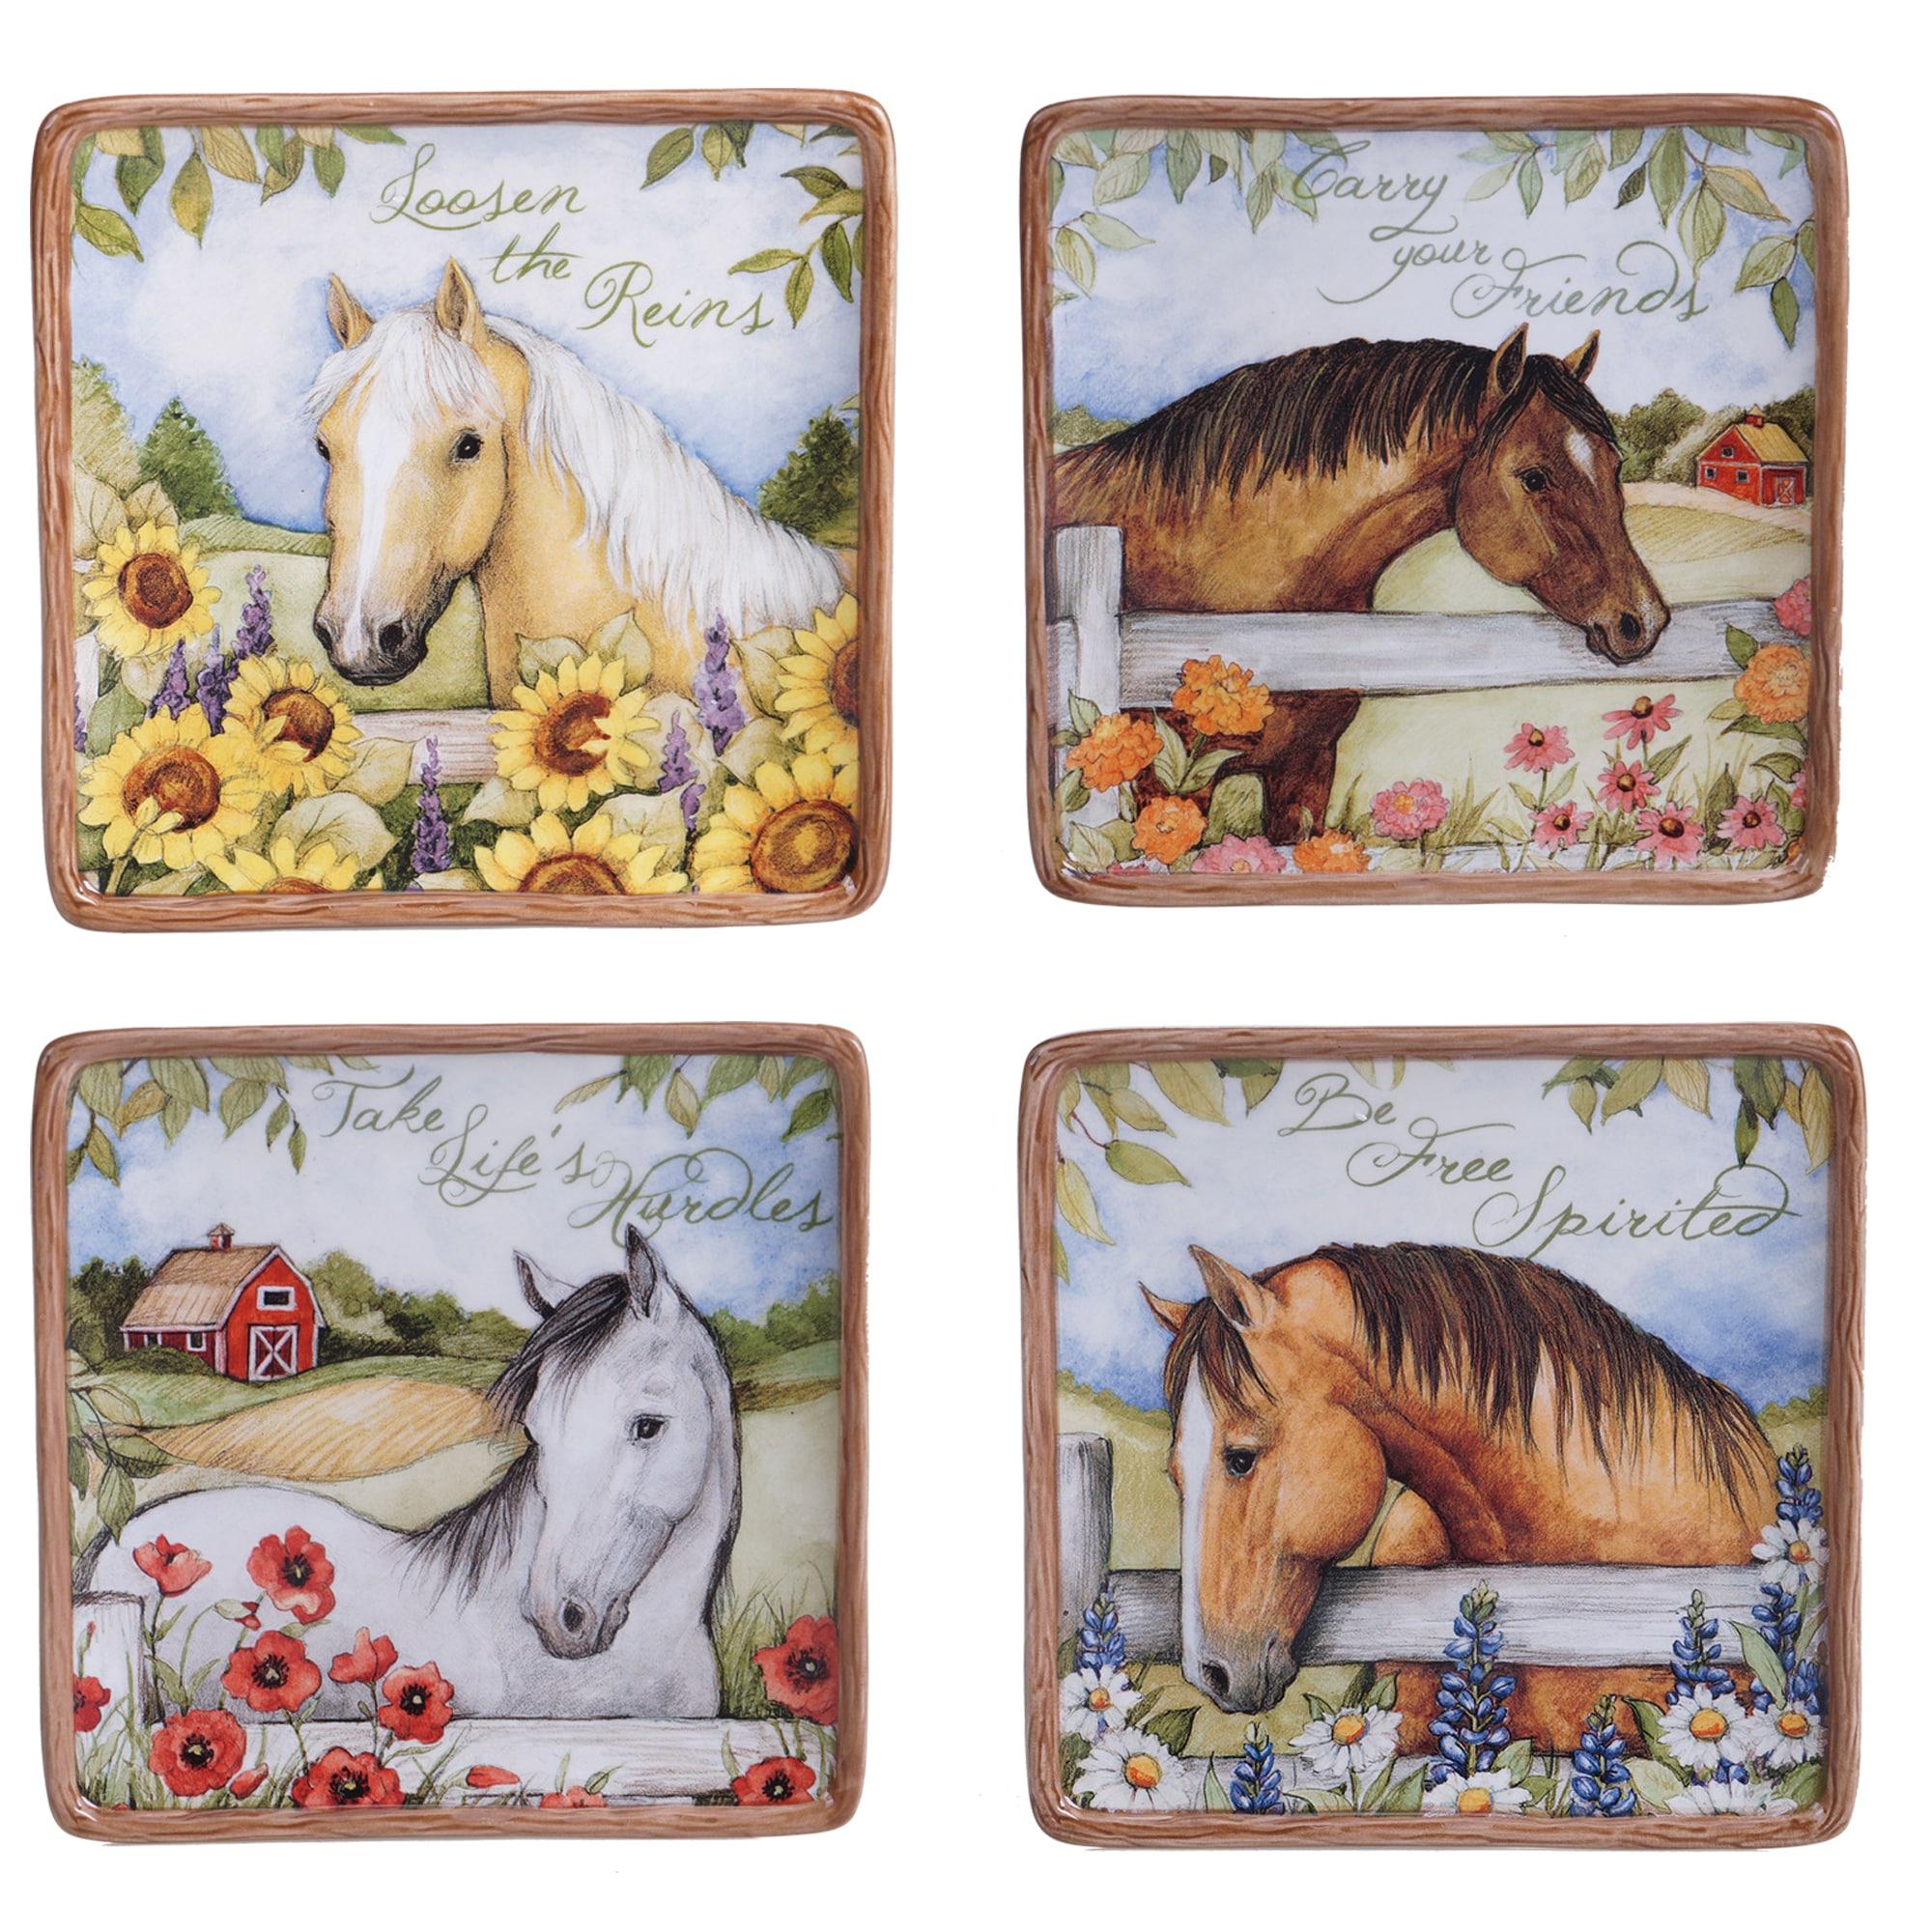 Certified Intl Heartland Multicolored Ceramic 6-inch Cana...